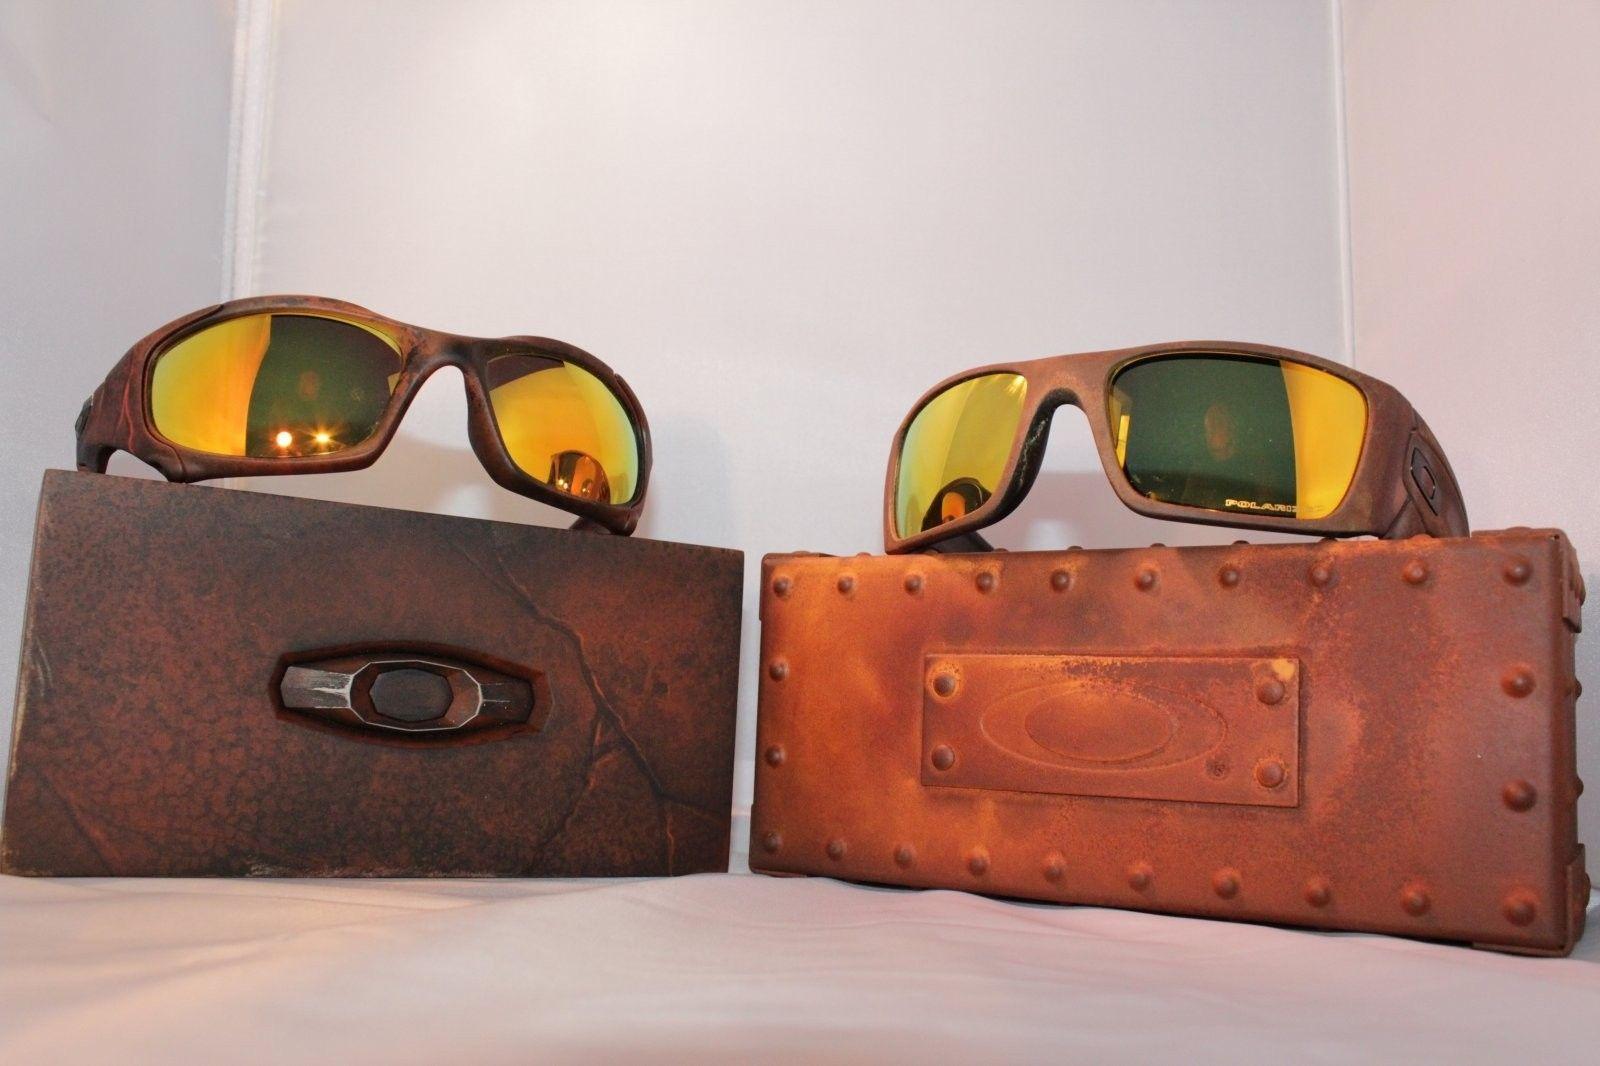 Custom Magma/Decay Pit Boss 1, Dr Chop Dirty Dog, Rust Face Off - oakley pics 10-24-14 (54).JPG